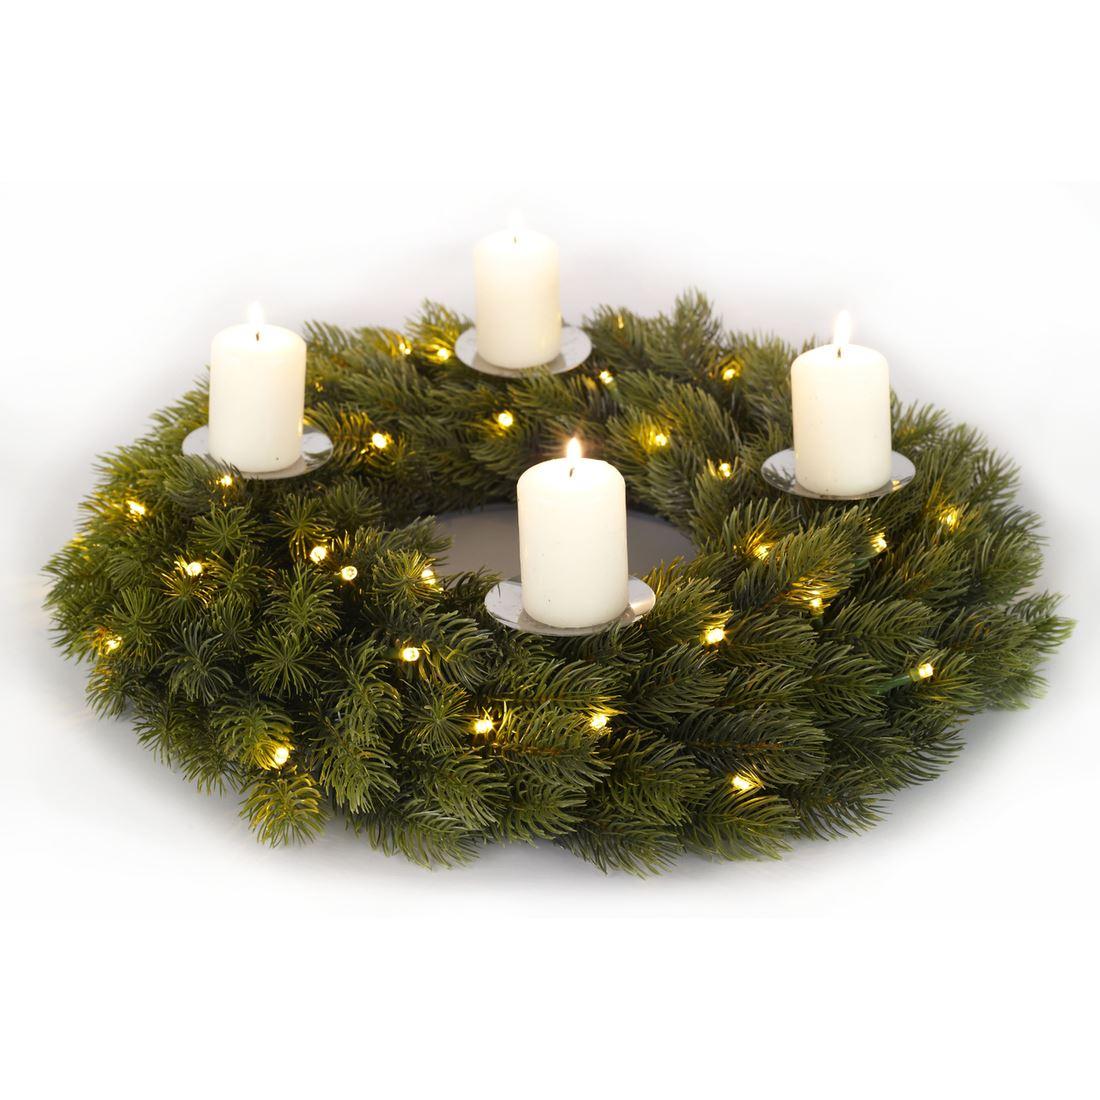 Luxury 40cm Pre Lit Christmas Advent Wreath Candle Holder Decoration